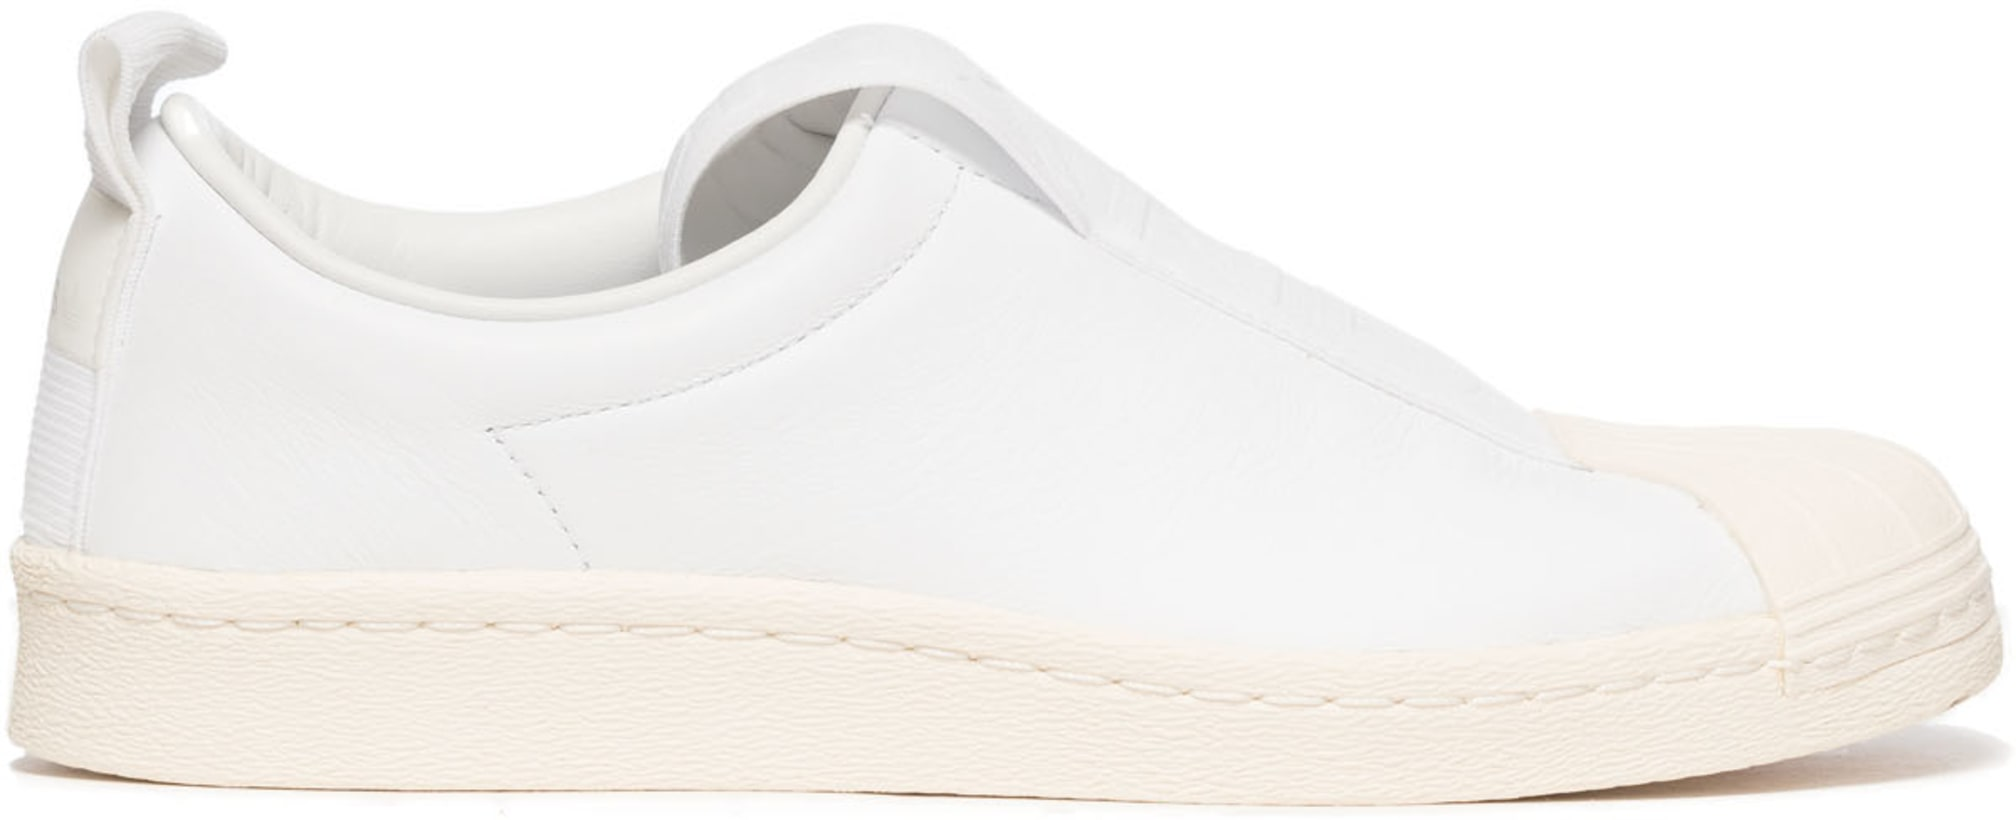 sports shoes 3b42f b7f7e adidas Originals - Superstar BW3S Slip On - Footwear White/Footwear  White/Off White